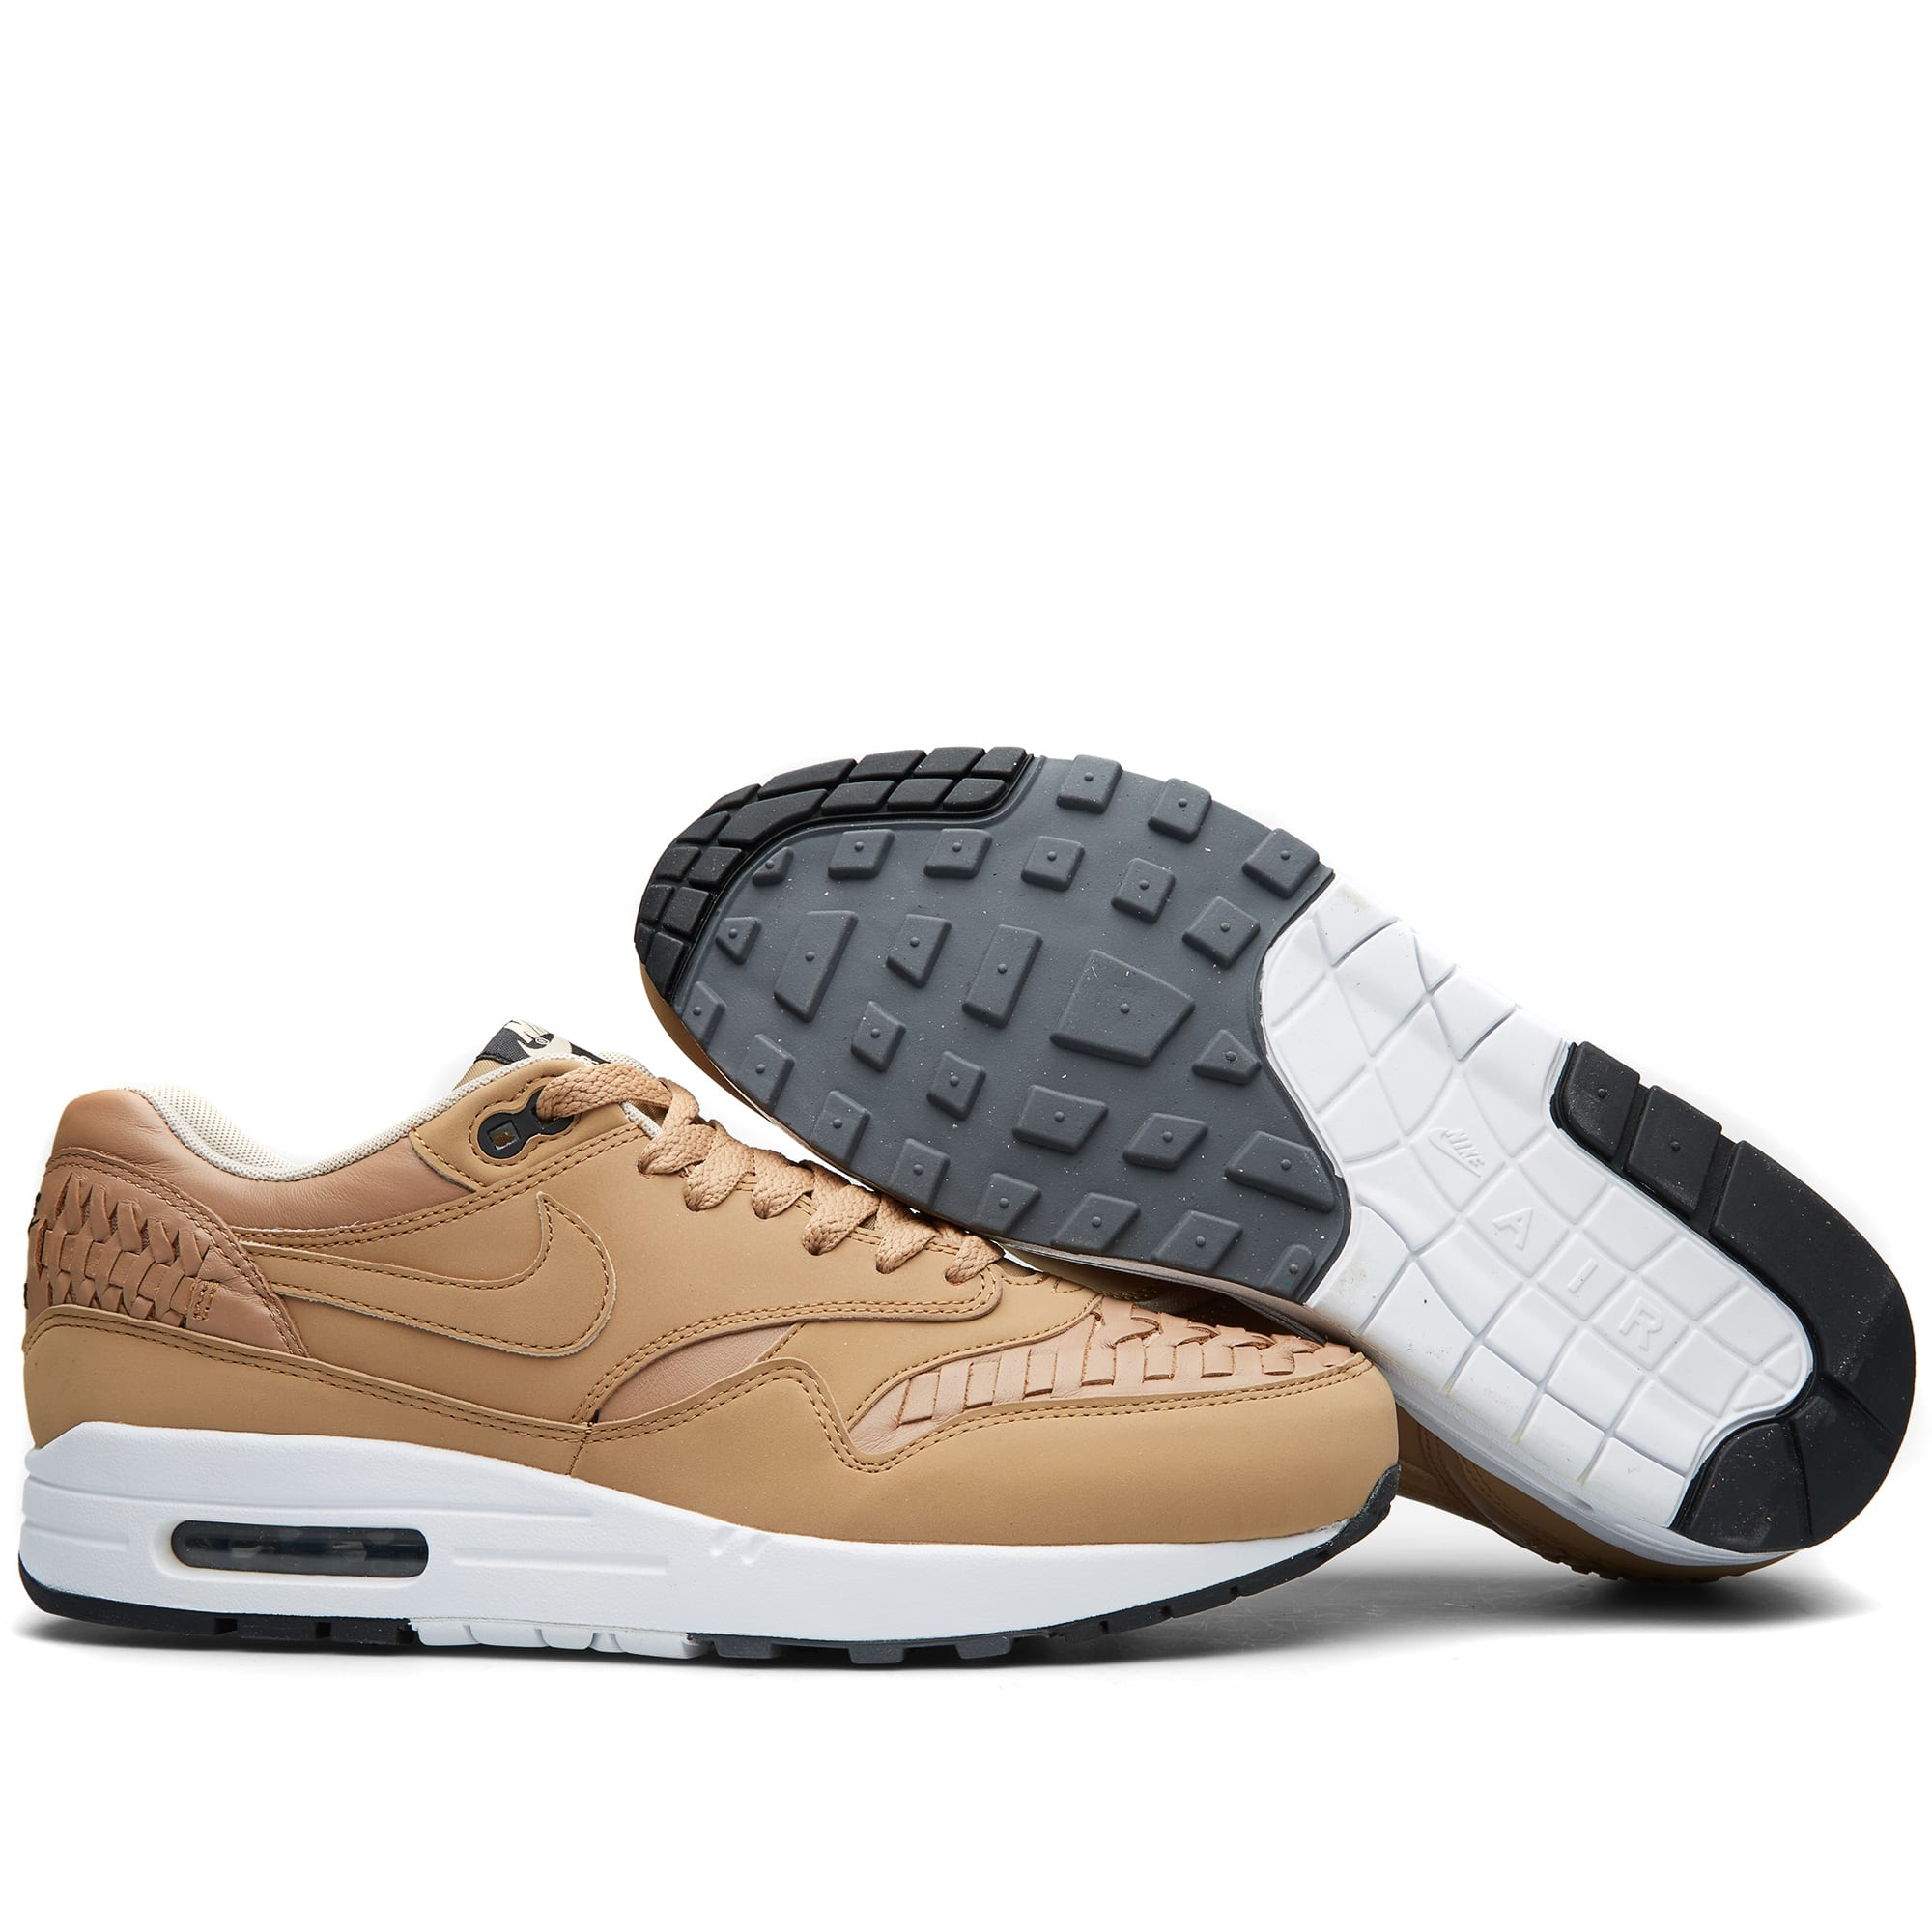 promo code 5ab17 15063 Nike Air Max 1 Woven Pale Shale   Black   END.